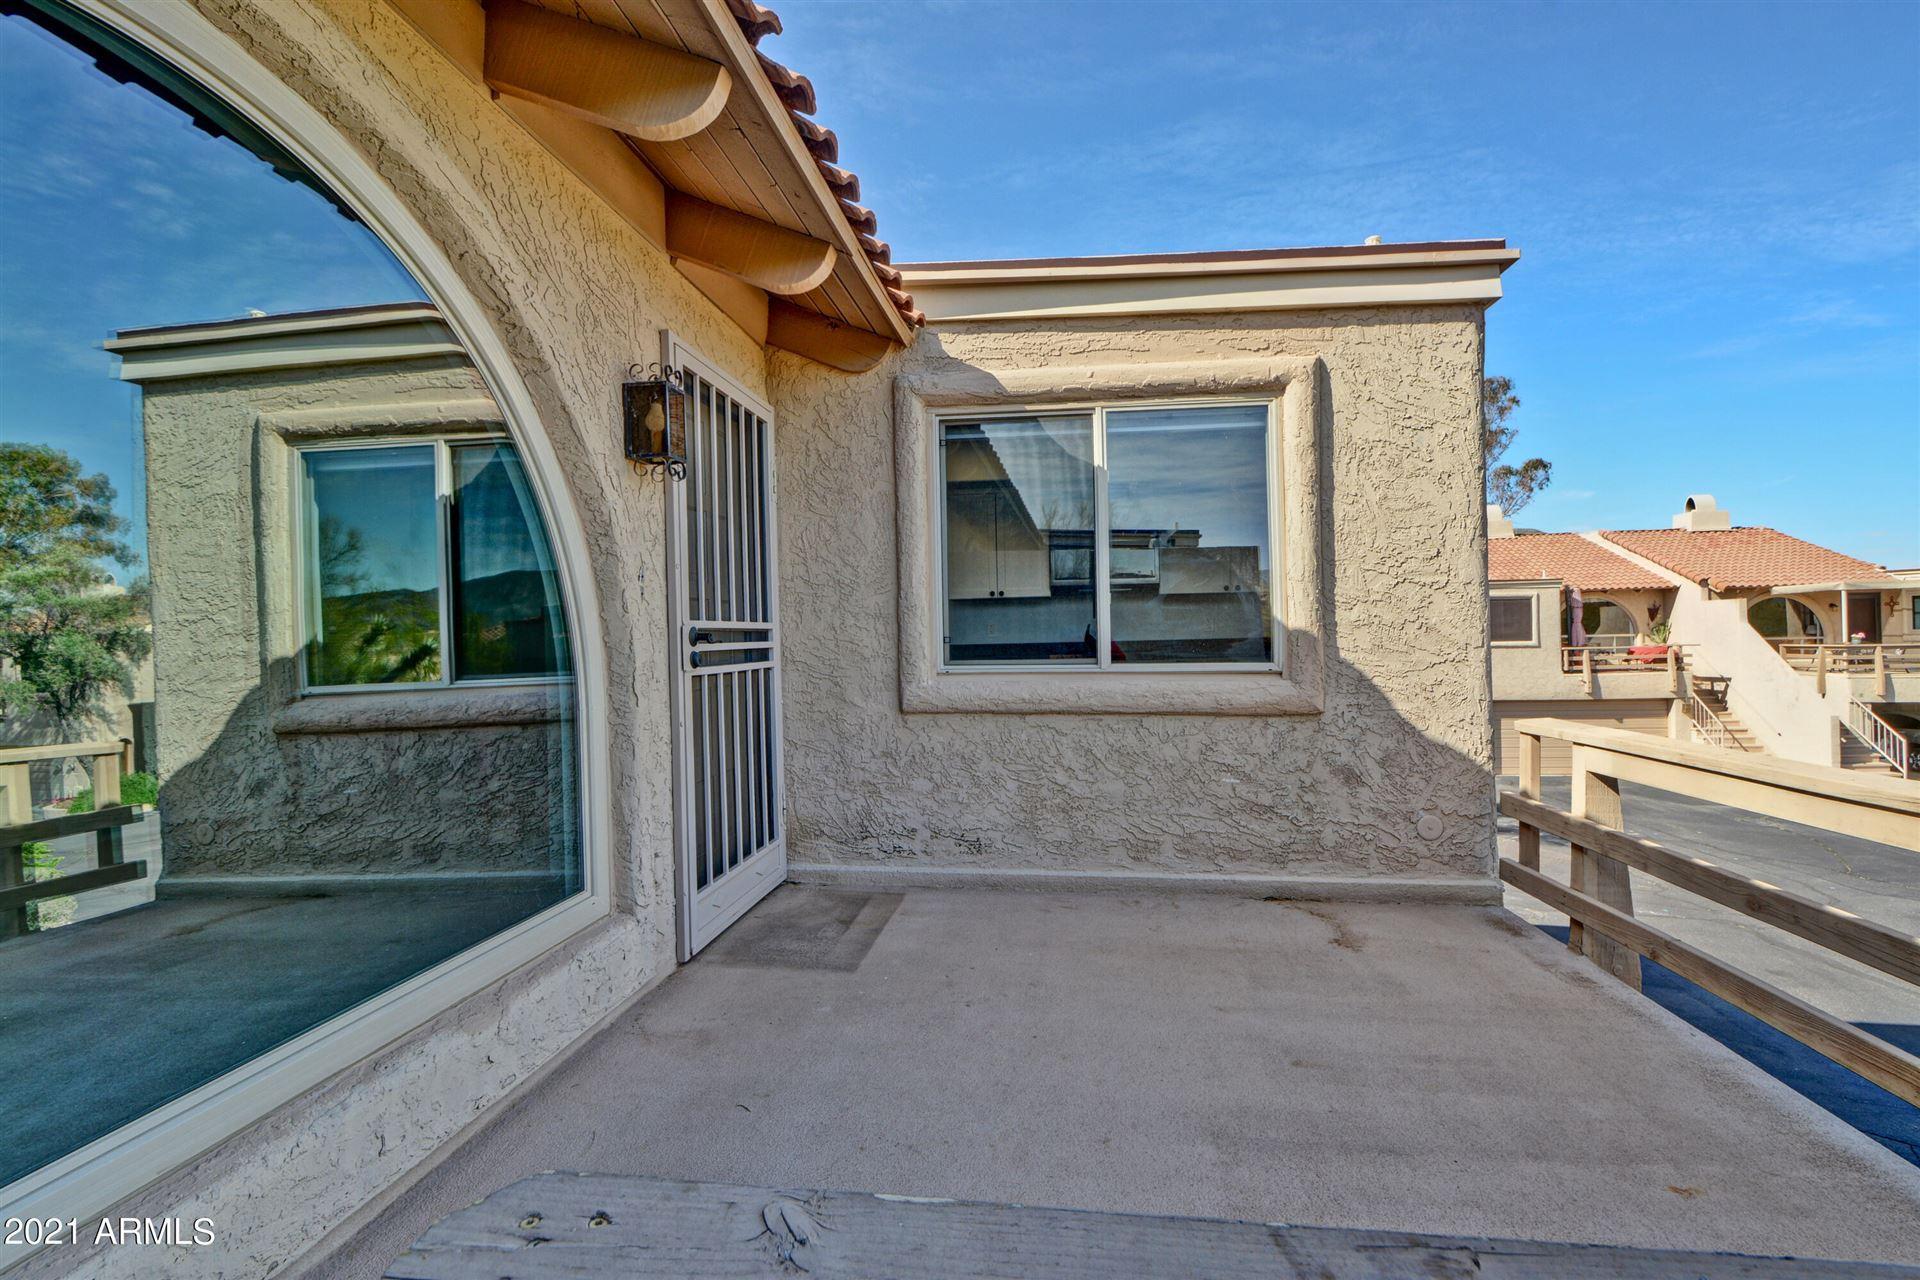 Photo of 7501 E HAPPY HOLLOW Drive #12, Carefree, AZ 85377 (MLS # 6217799)